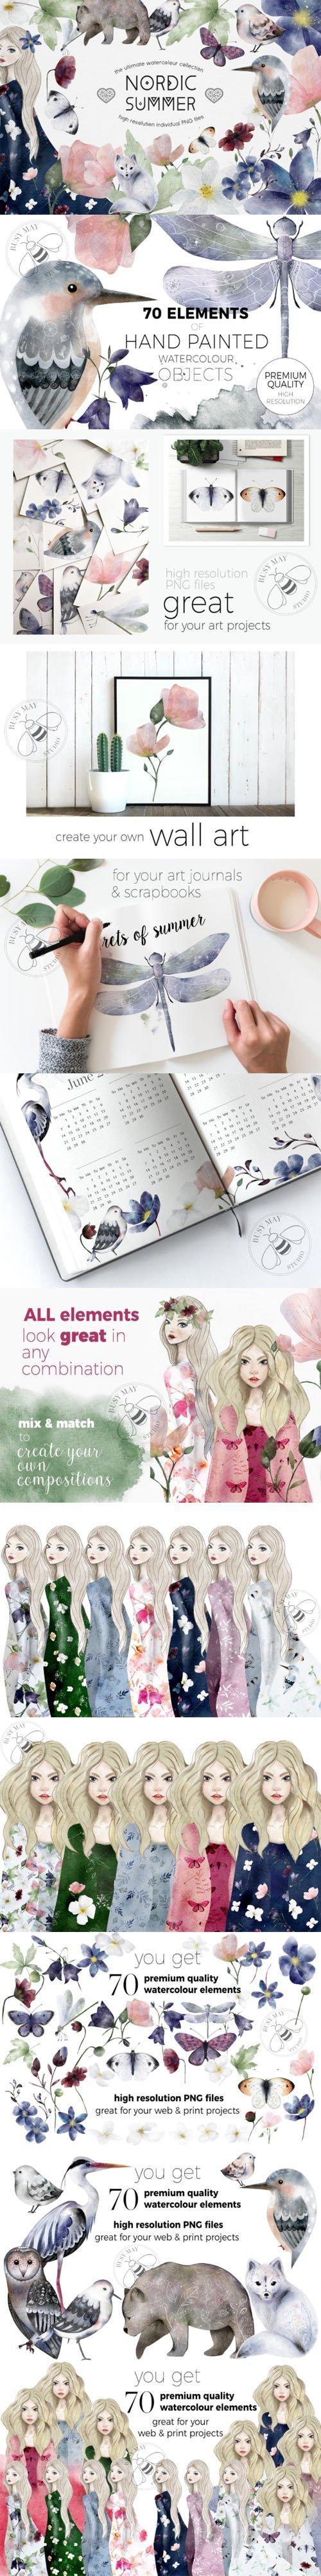 Nordic Summer - 70 Premium Quality Watercolor Ink Elements